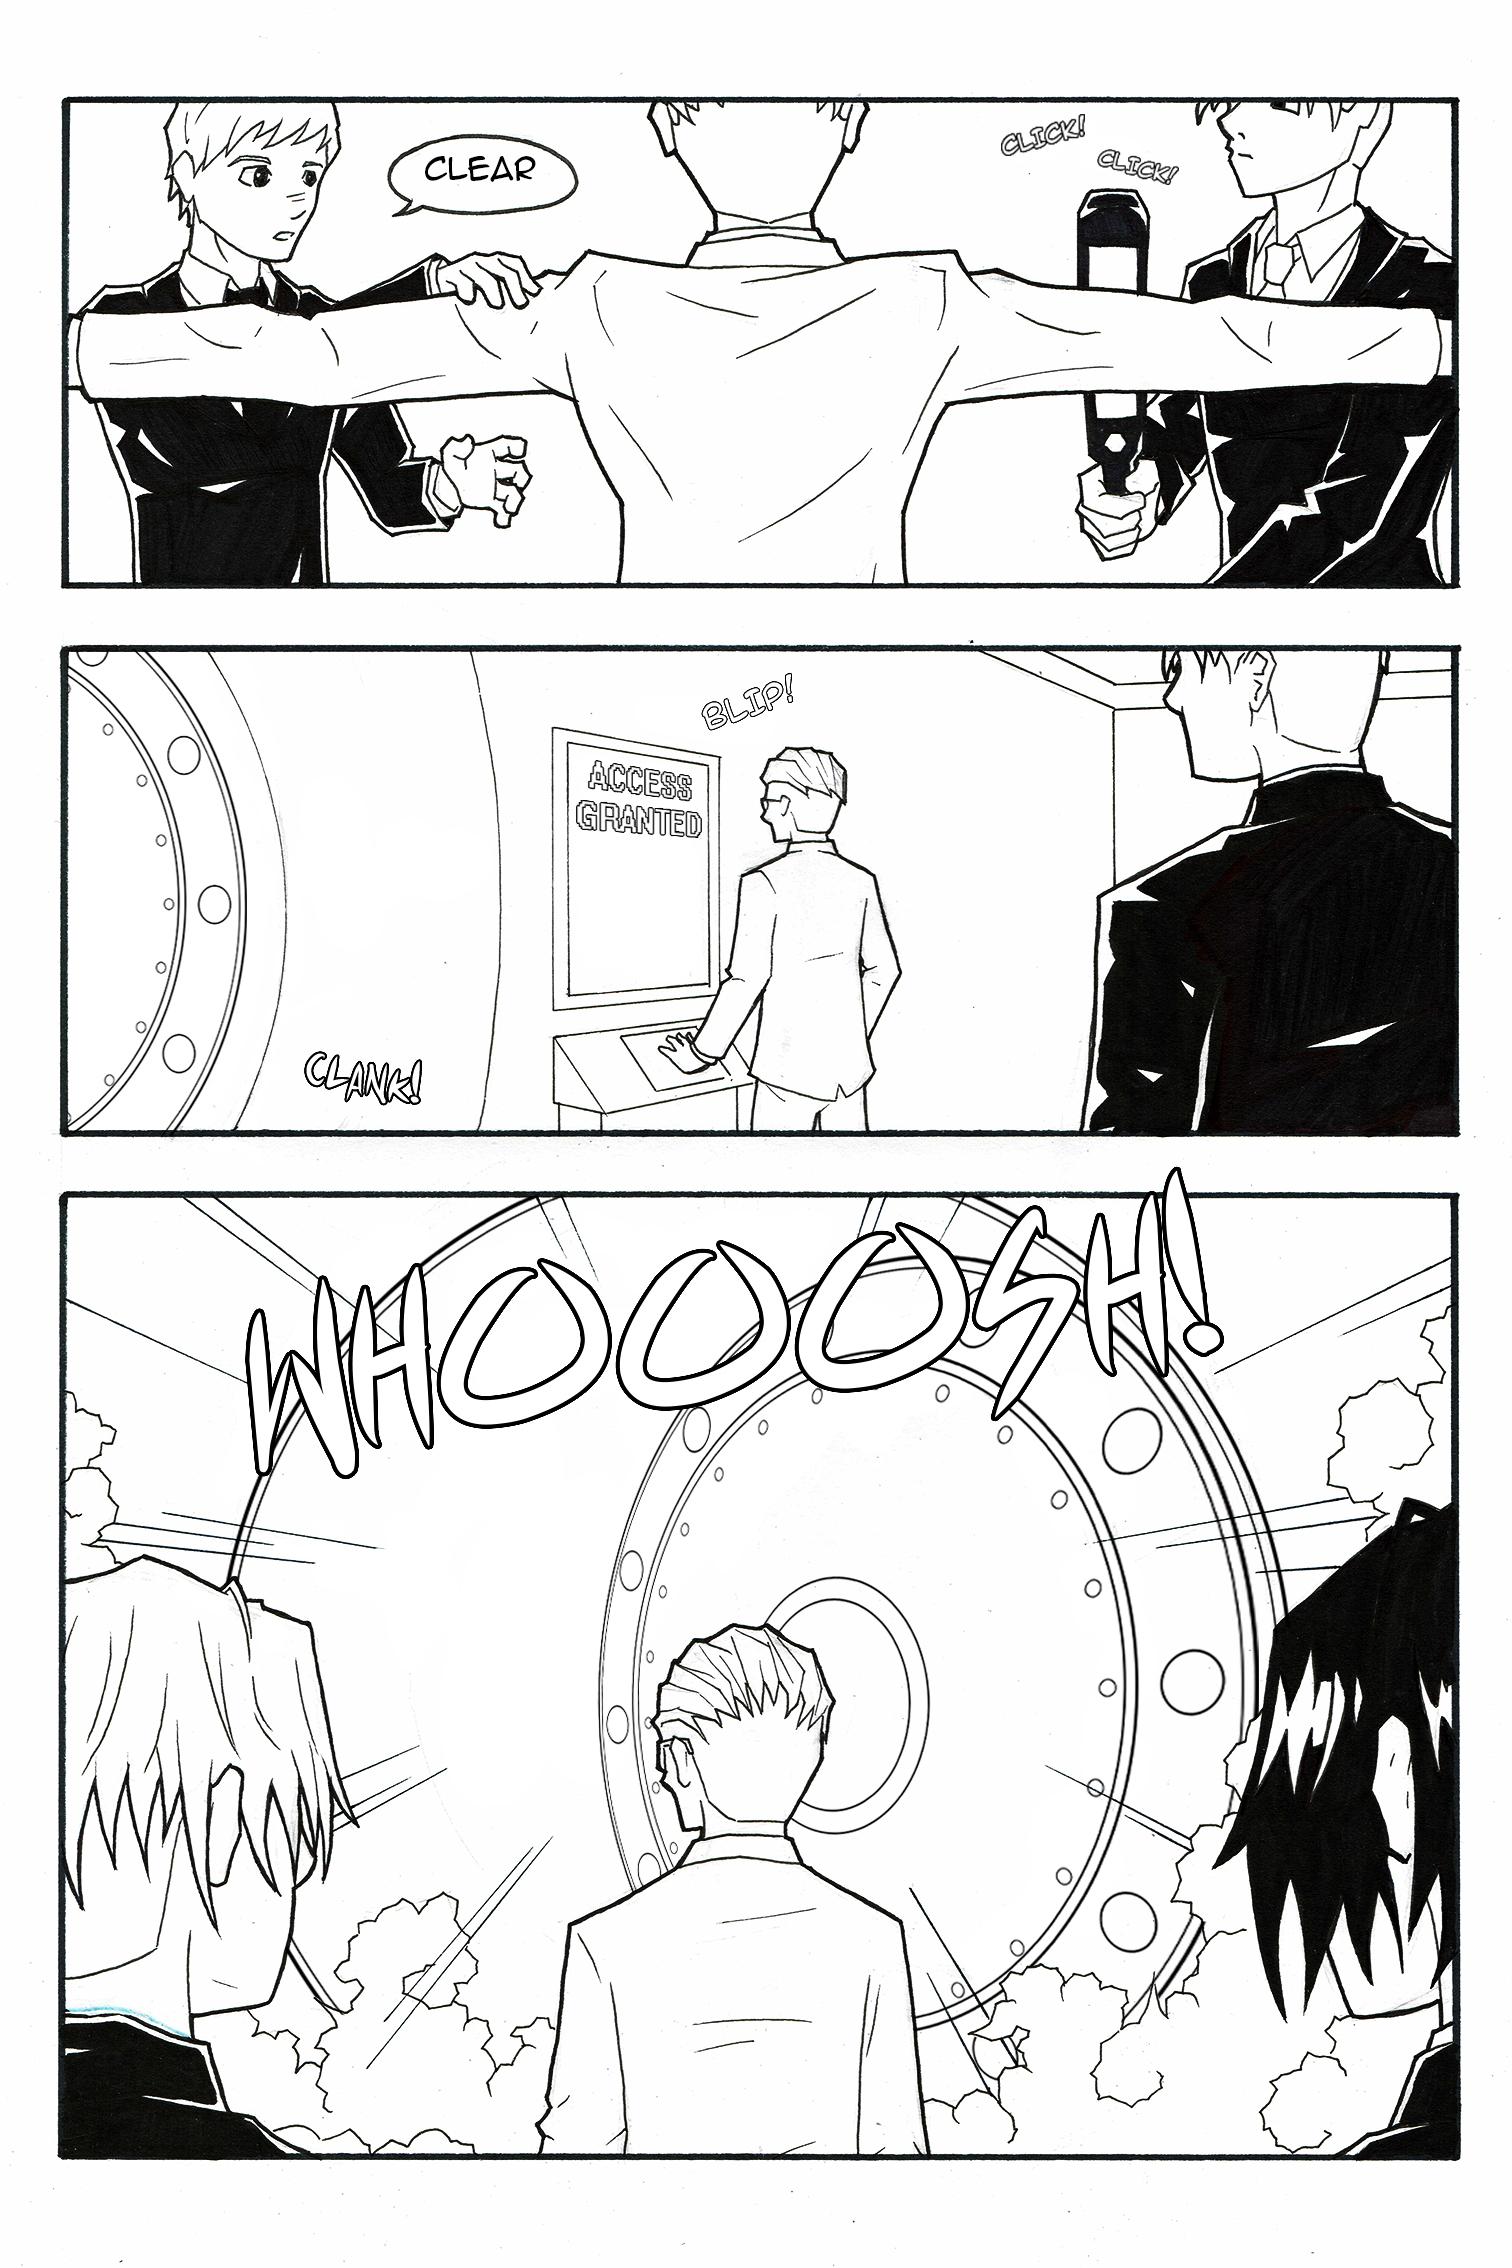 C1 PAGE 16.jpg